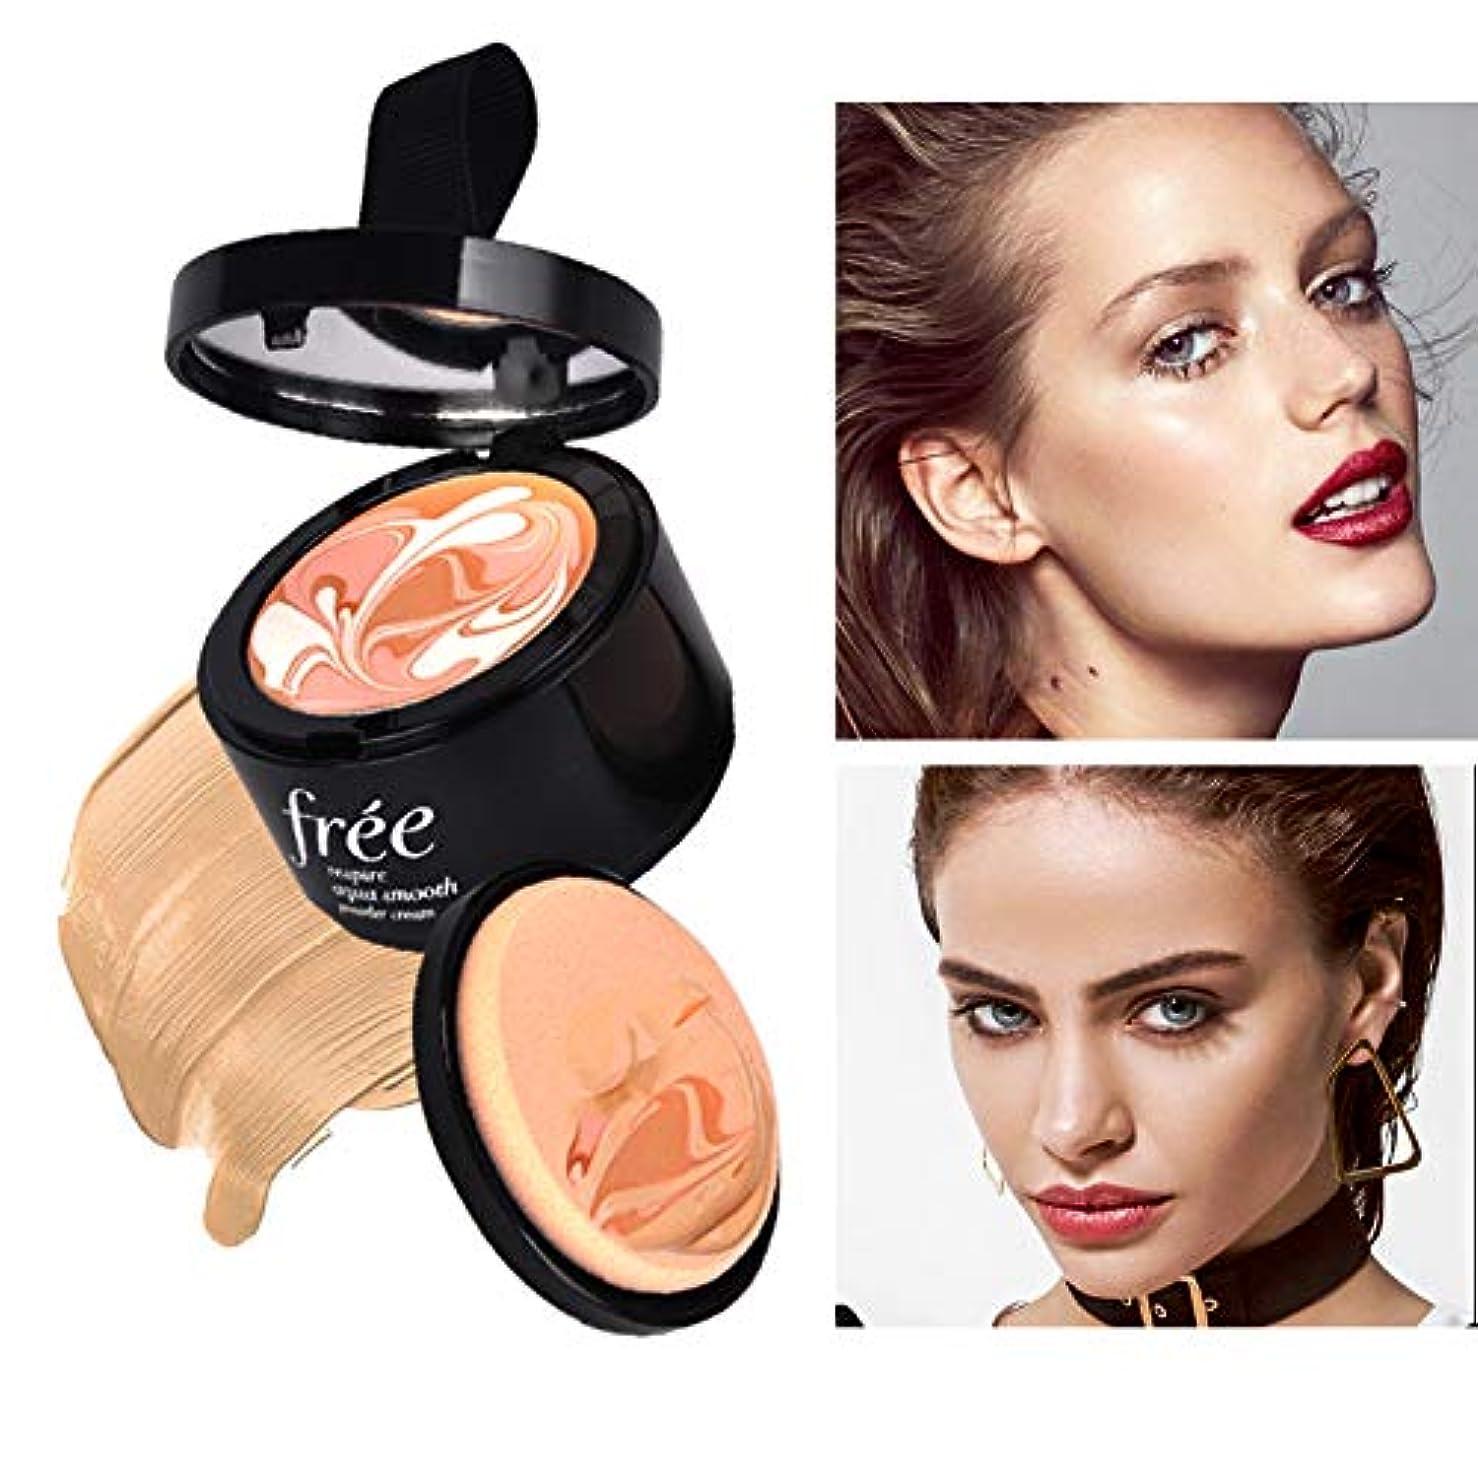 Foundation Cream Concealer moisturizing Whitening flawless makeup For Face Beauty Base Makeup ファンデーションクリームコンシーラーモイスチャライジングホワイトニングフェイシャルメイクアップフェイシャルビューティベースメイクアップ